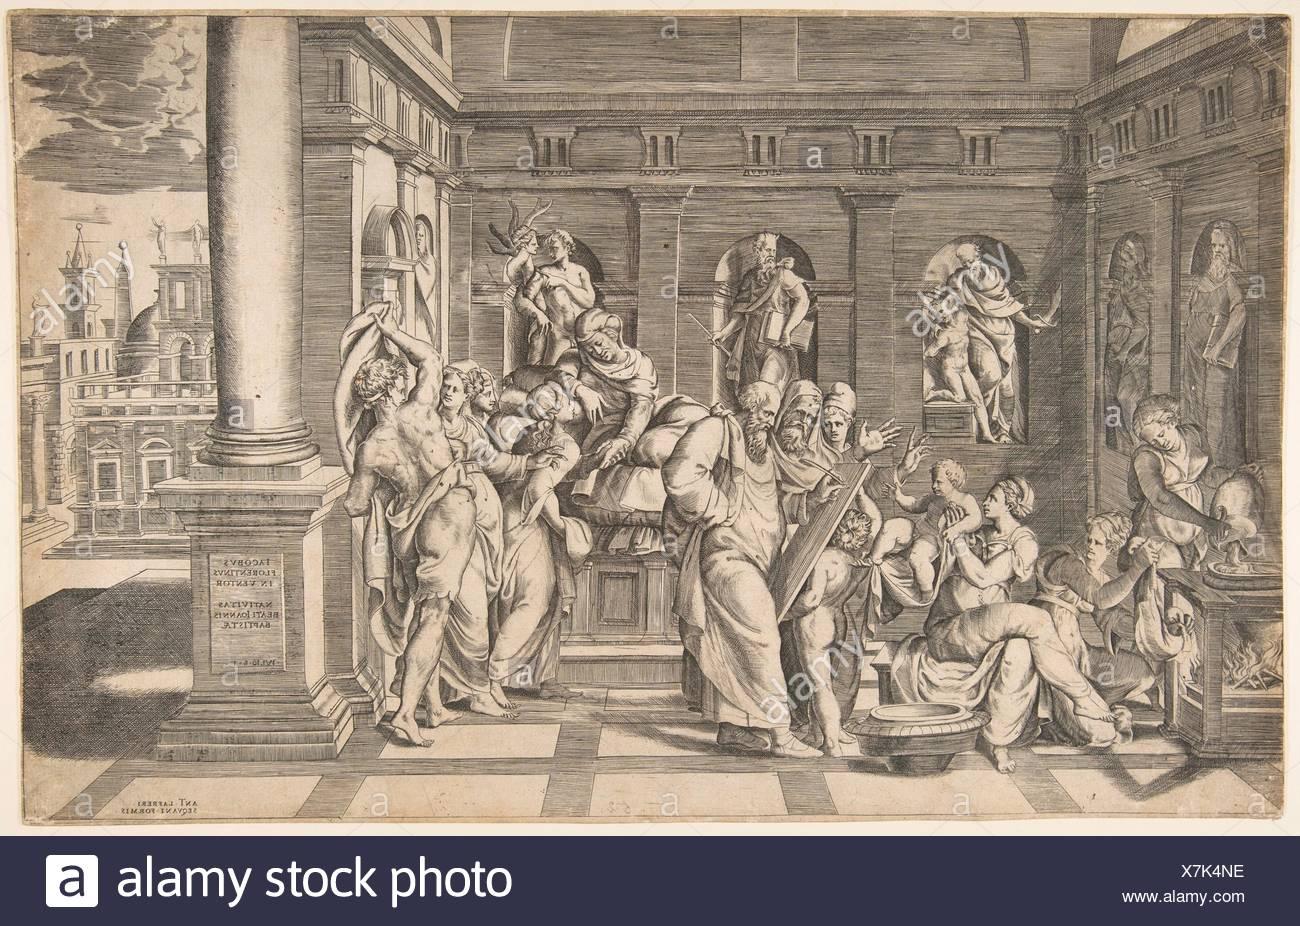 The birth of Saint John the Baptist. Artist: Giulio Bonasone (Italian, active Rome and Bologna, 1531-after 1576); Publisher: Antonio Lafreri (French, Stock Photo